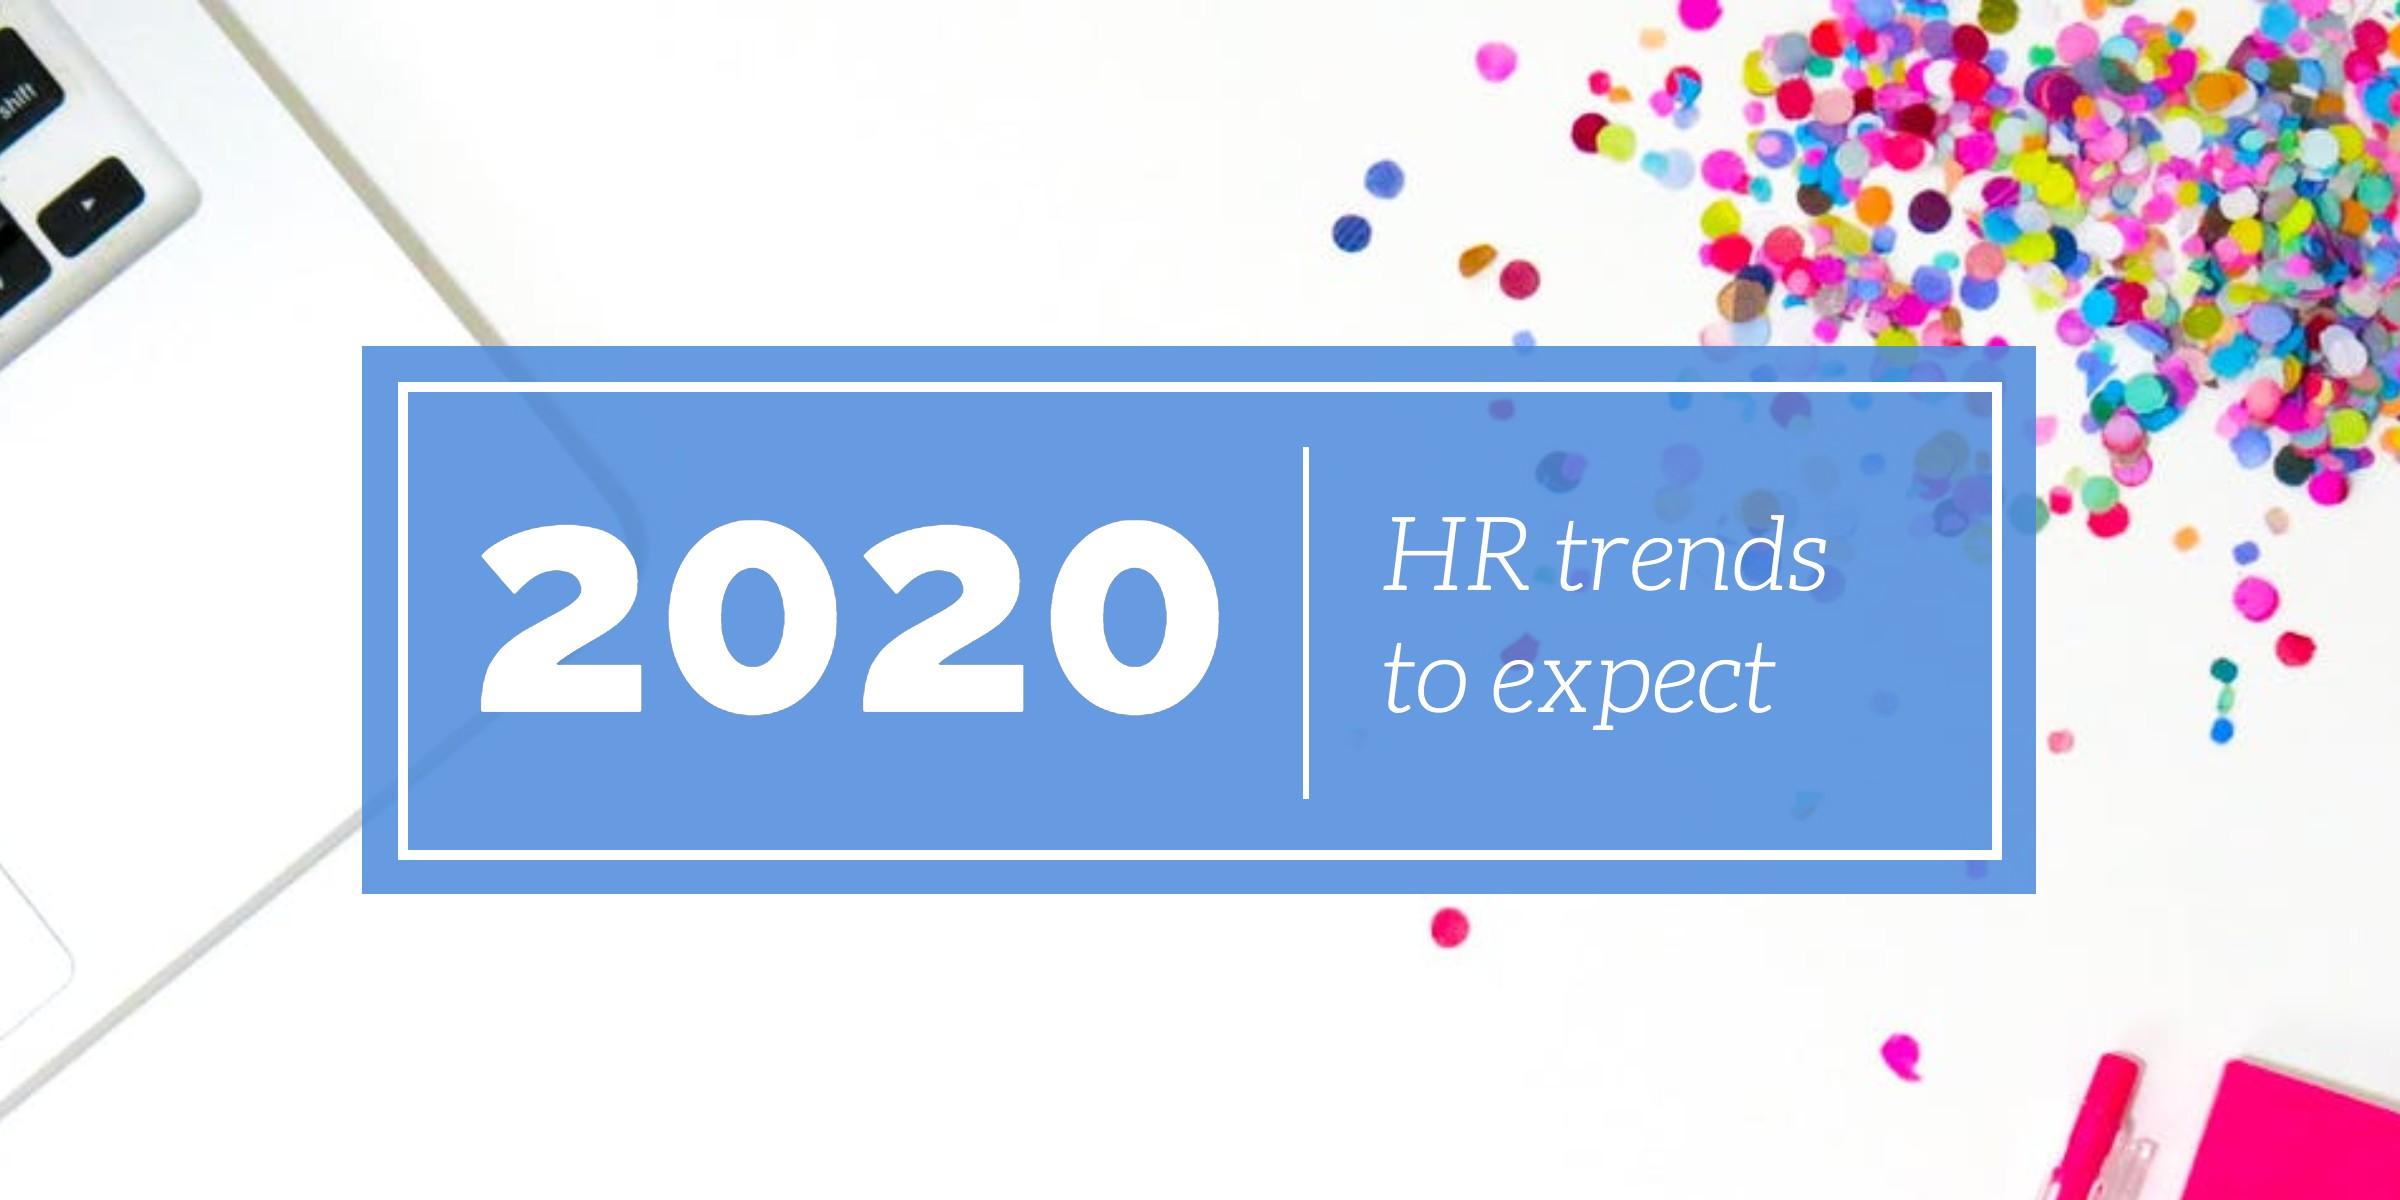 hr-trends-2020